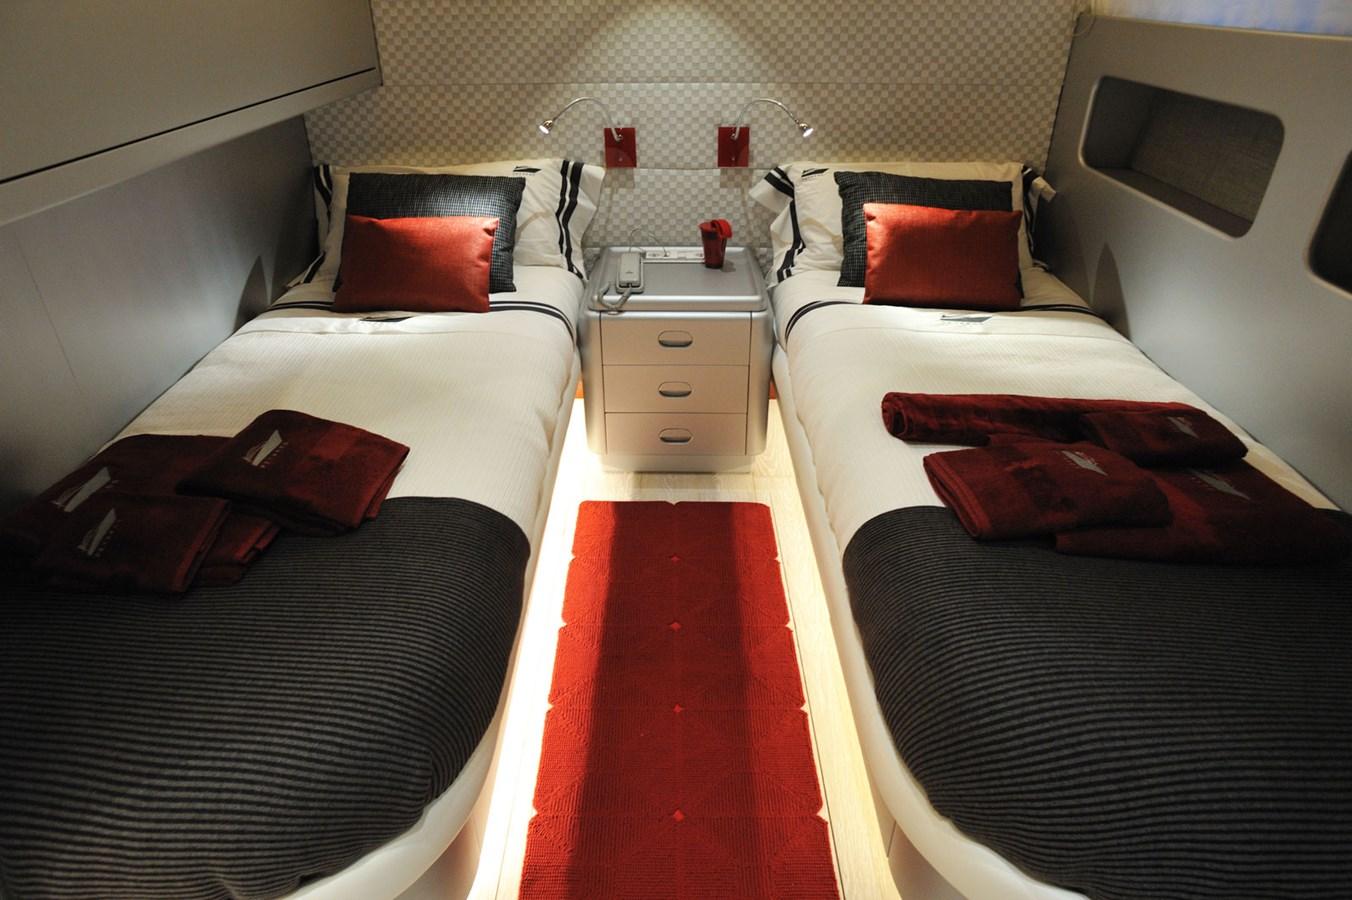 Mondomarine 85 Petardo - Twin Cabin 2 1995 MondoMarine 85 C Motor Yacht 2735404